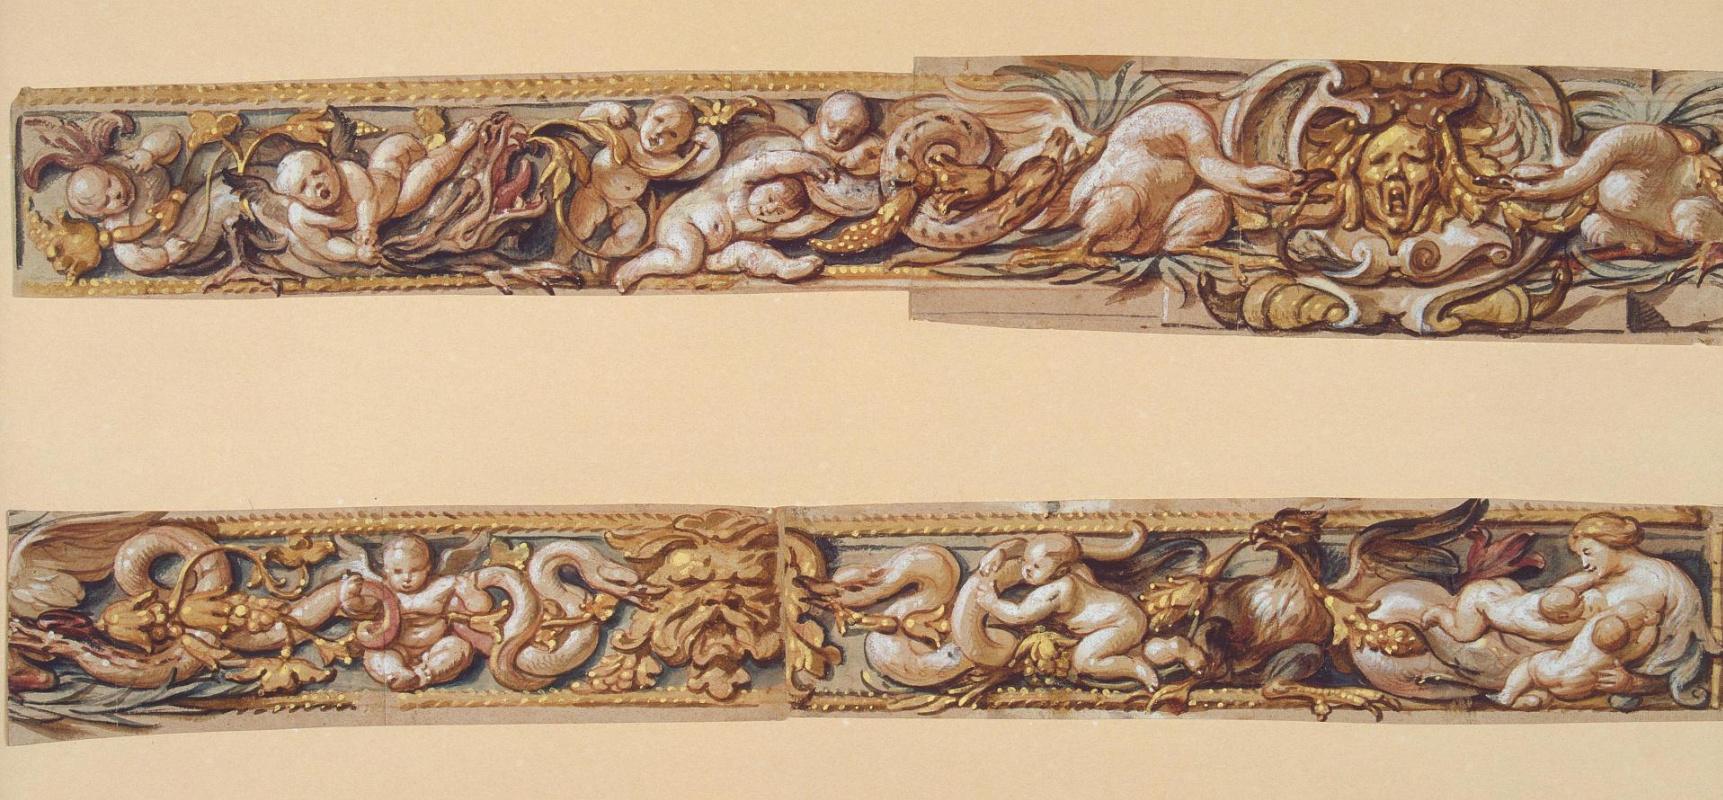 Jacob Jordaens. Decorative frieze